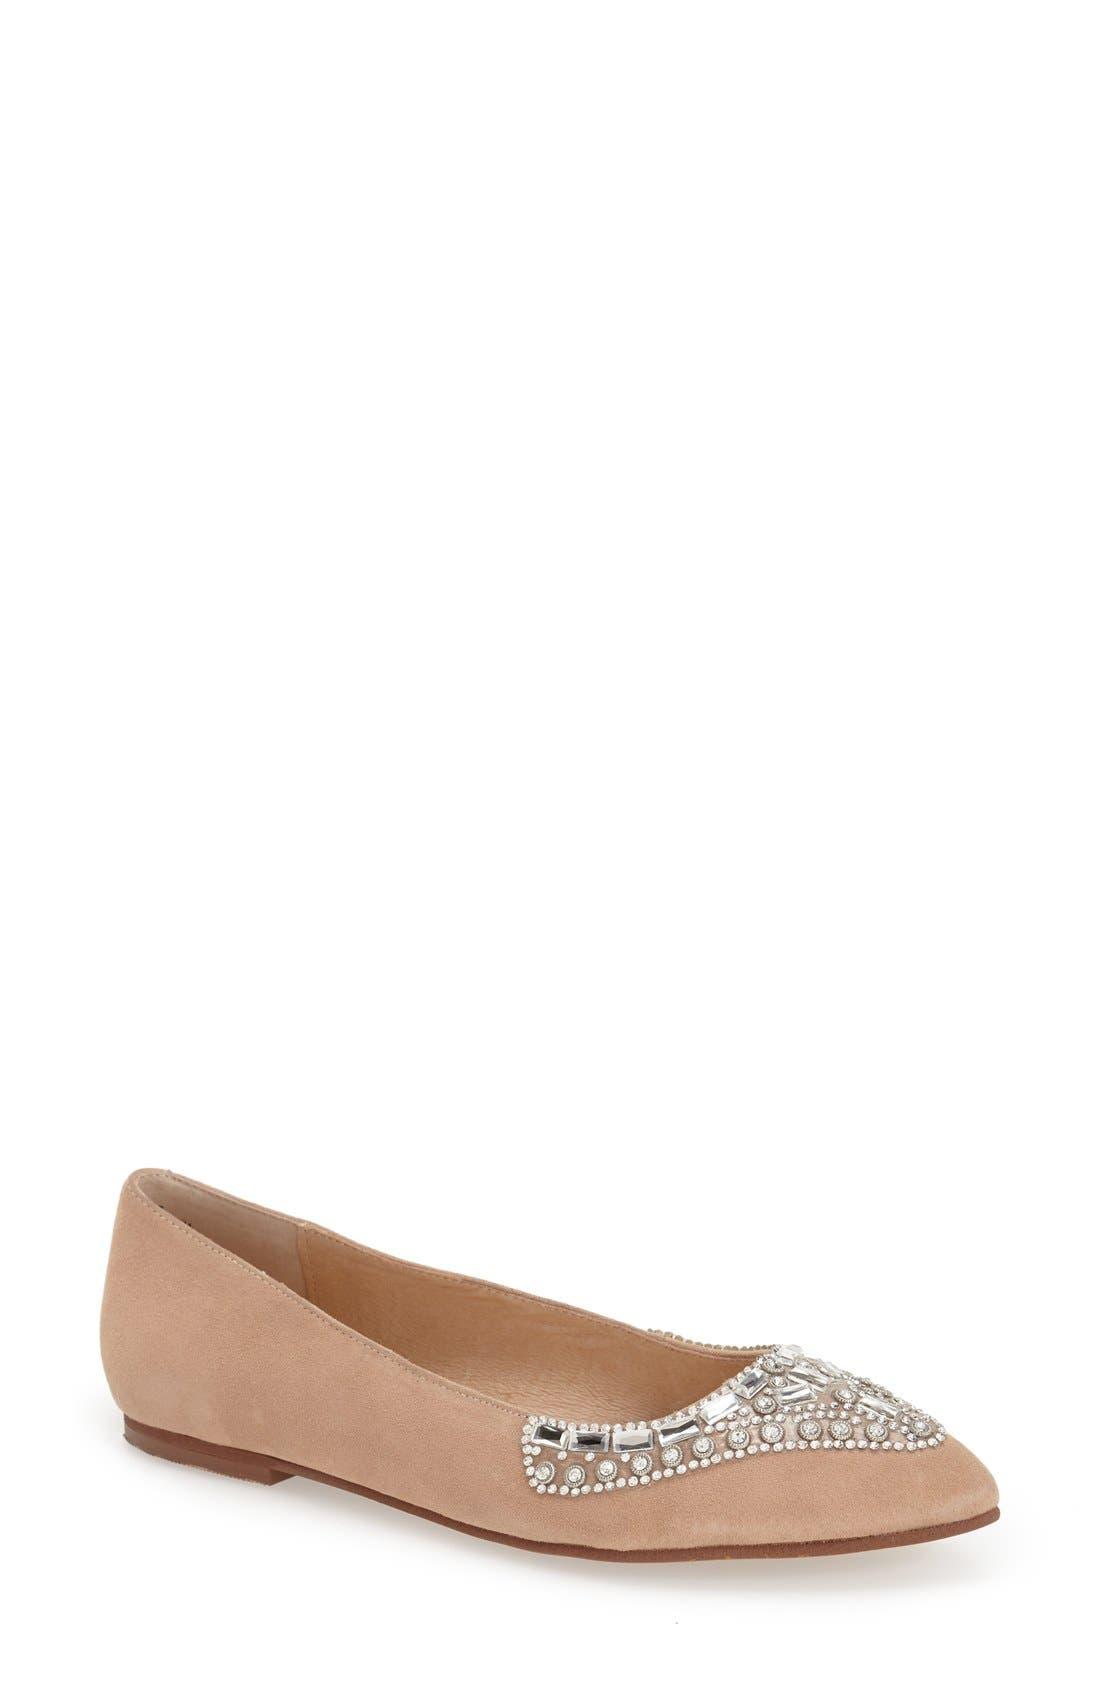 Kristin Cavallari 'Caela' Embellished Flat (Women)